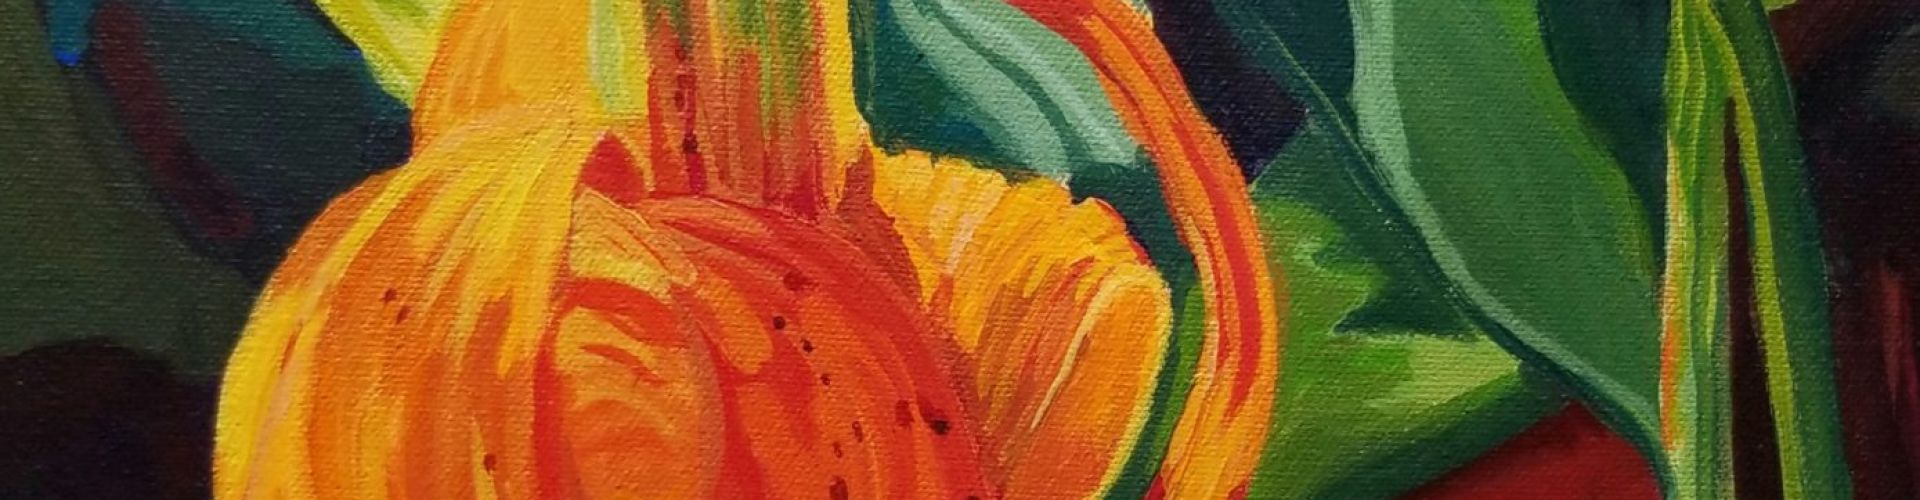 Woodland Lily painting by Linda Lovisa